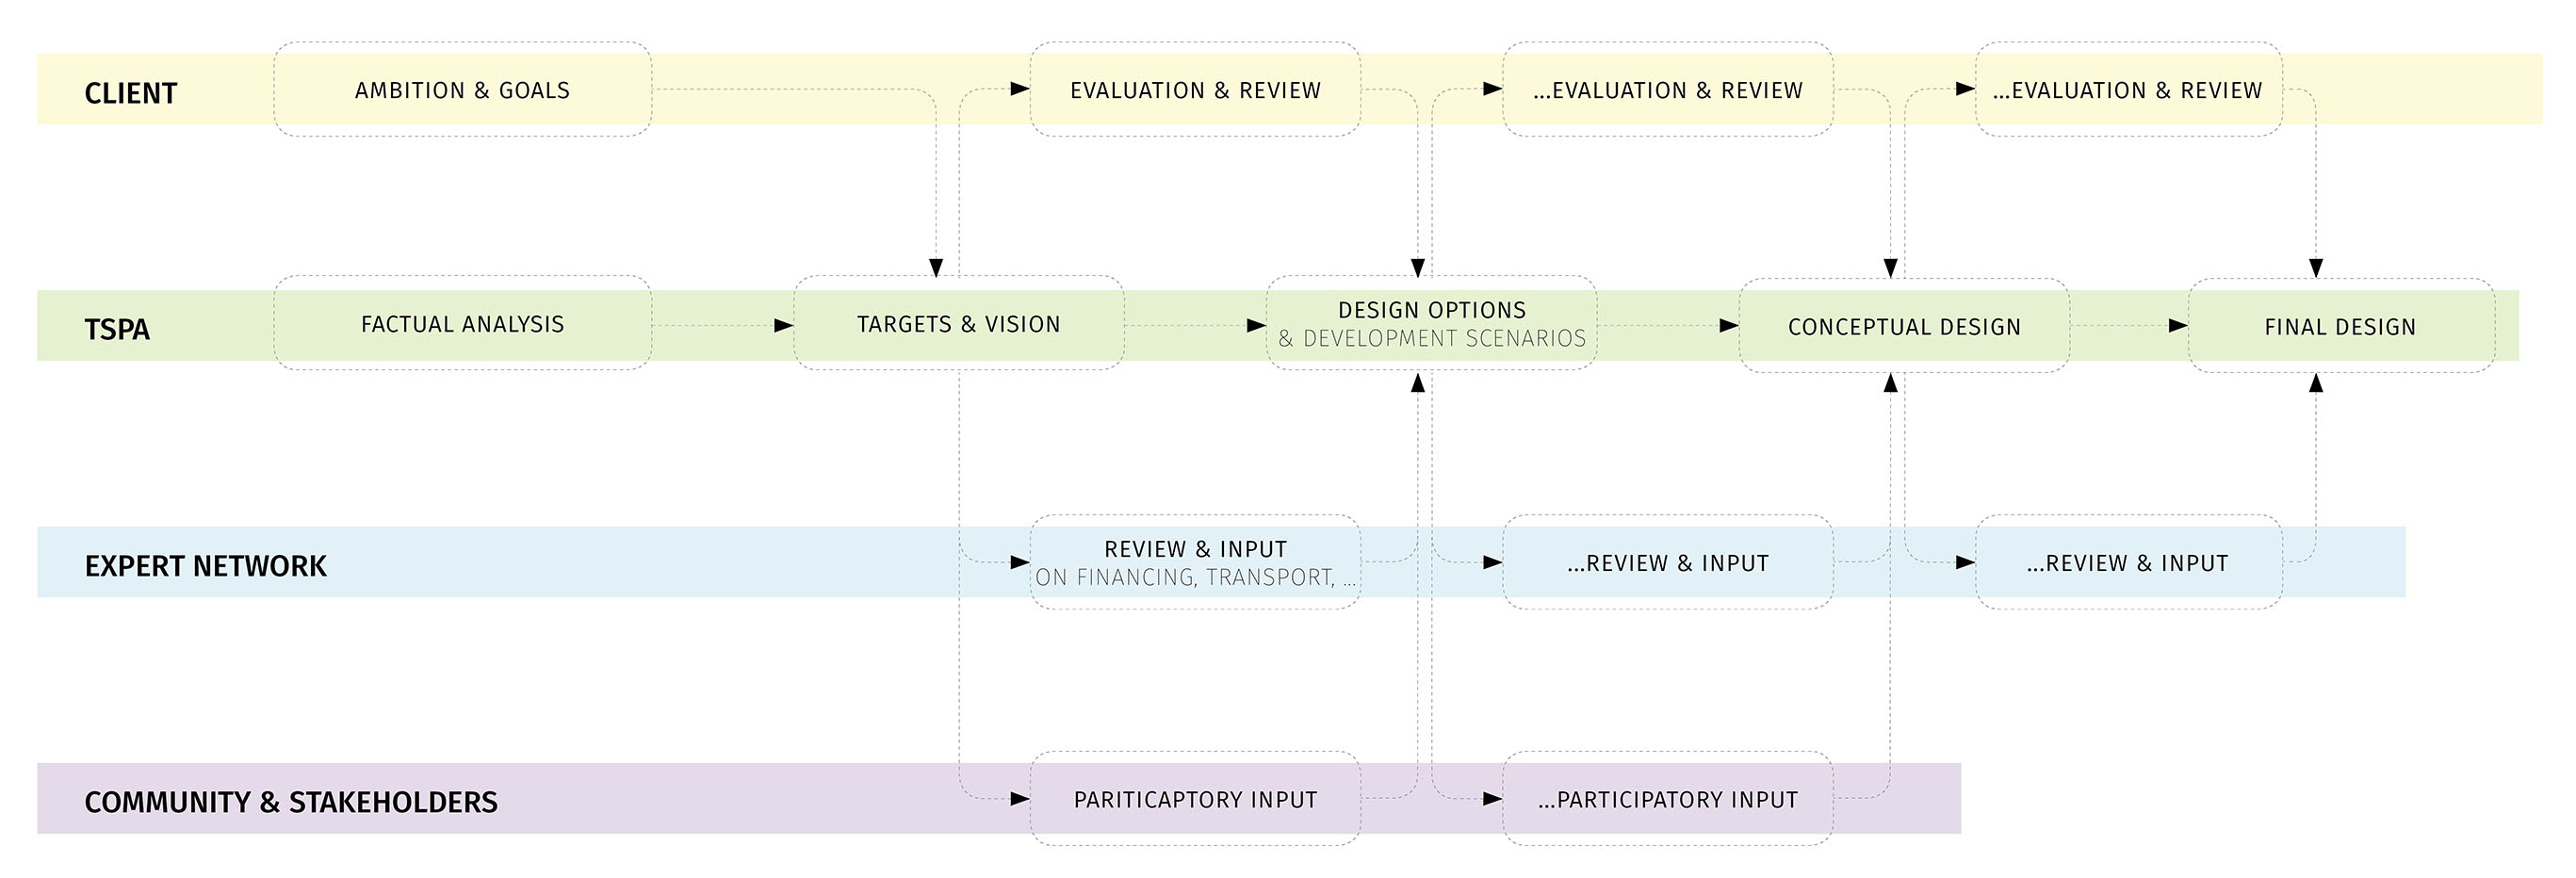 TSPA Process